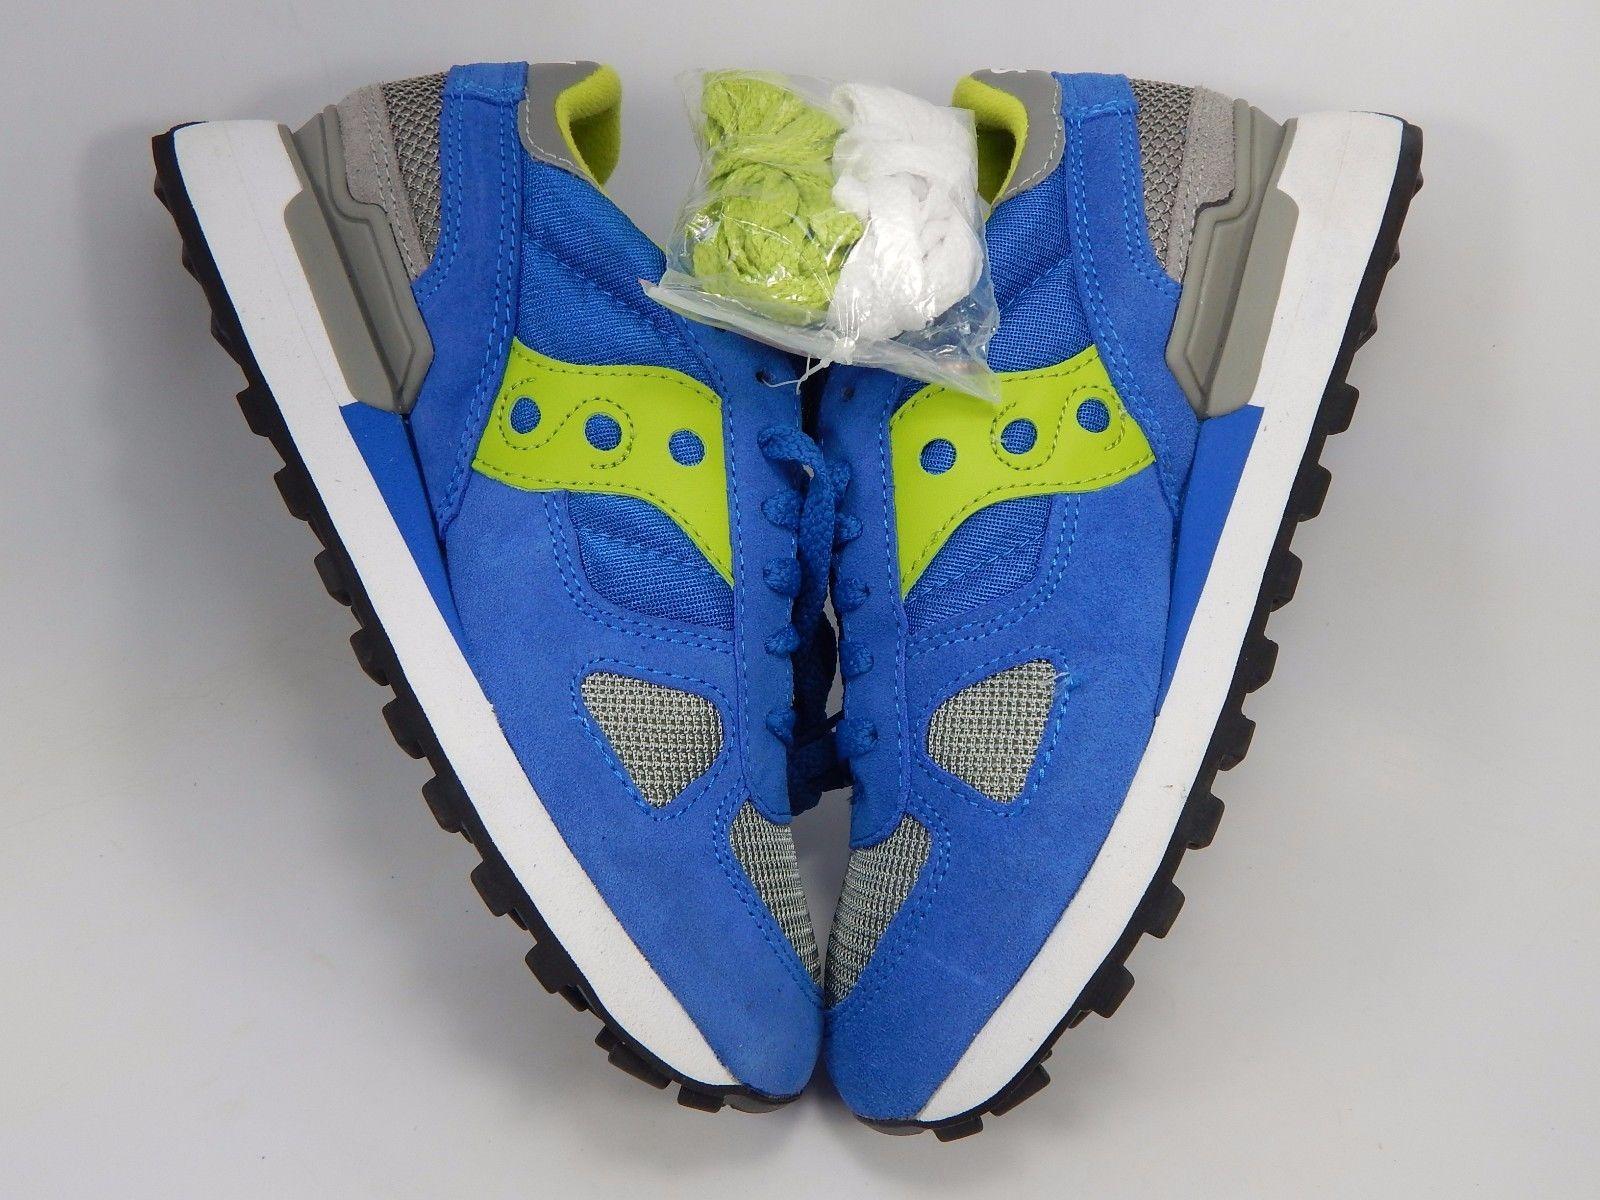 Saucony Shadow Original Women's Running Shoes Size US 7 M (B) EU 38 S1108-585